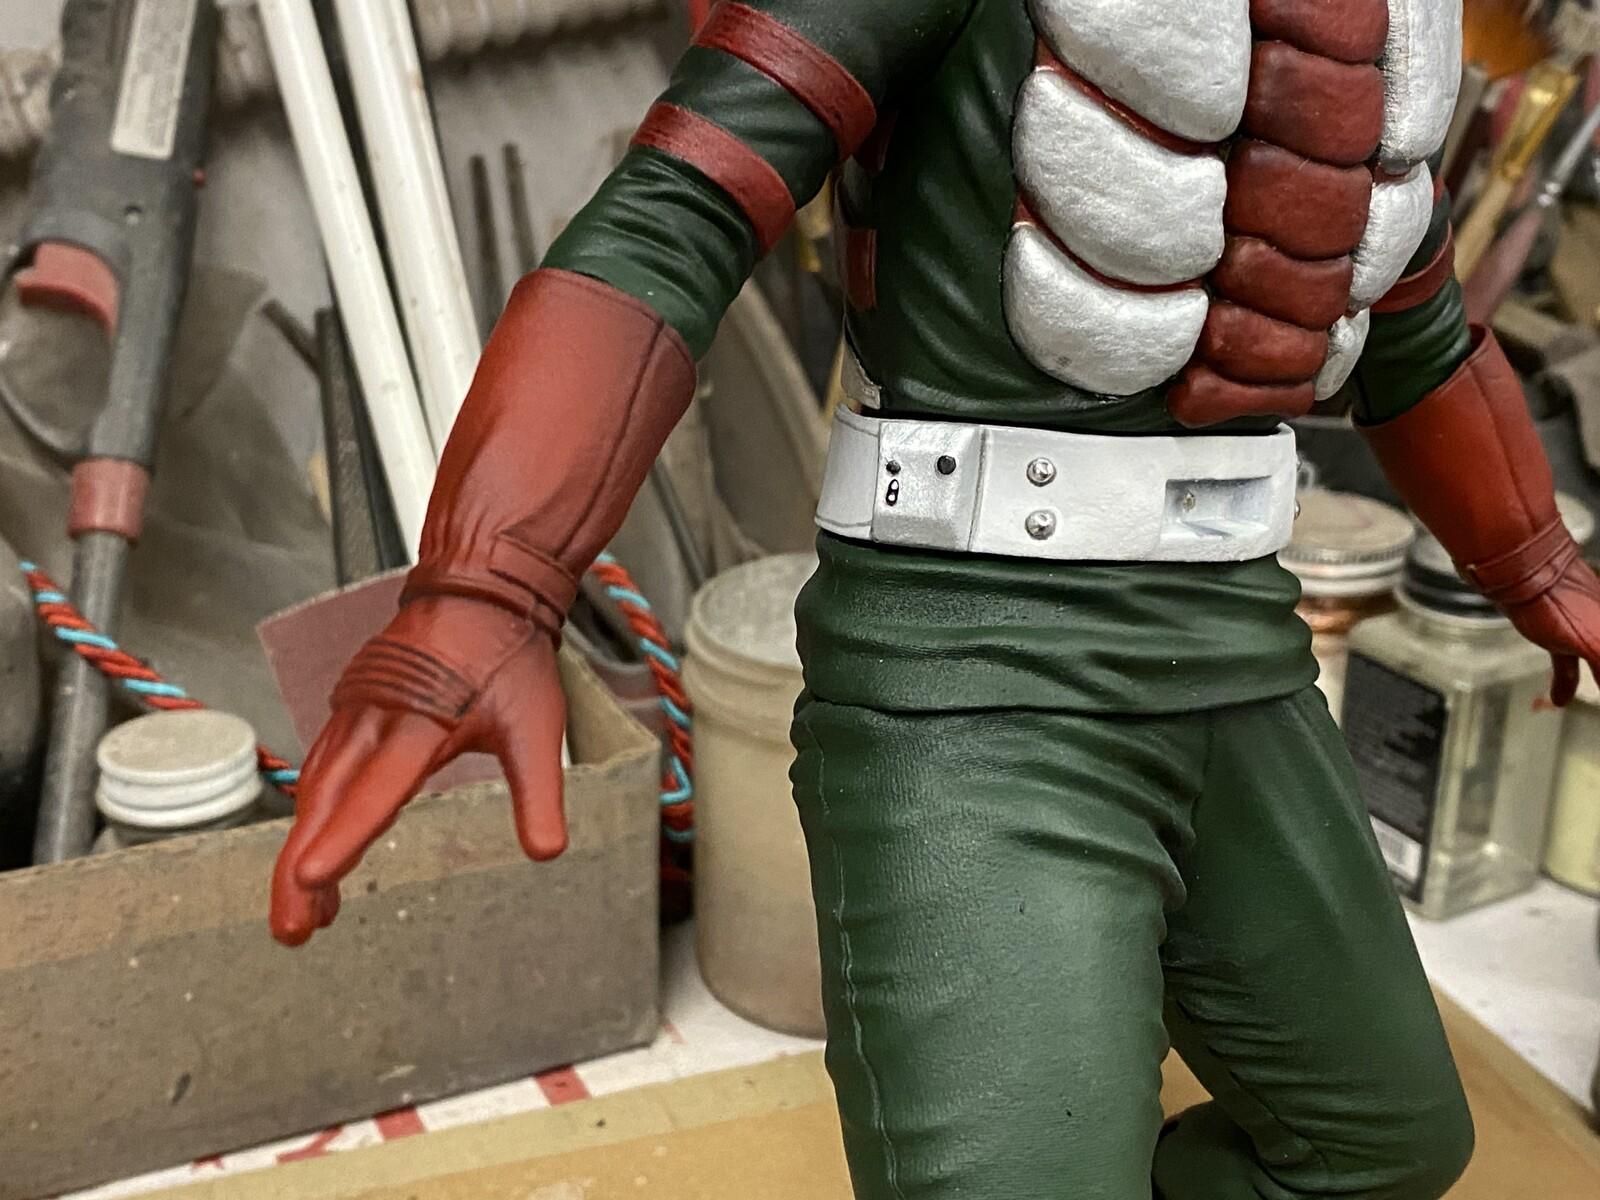 Kamen Rider V3 Art Statue 仮面ライダー V3  W.I.P.  https://www.solidart.club/